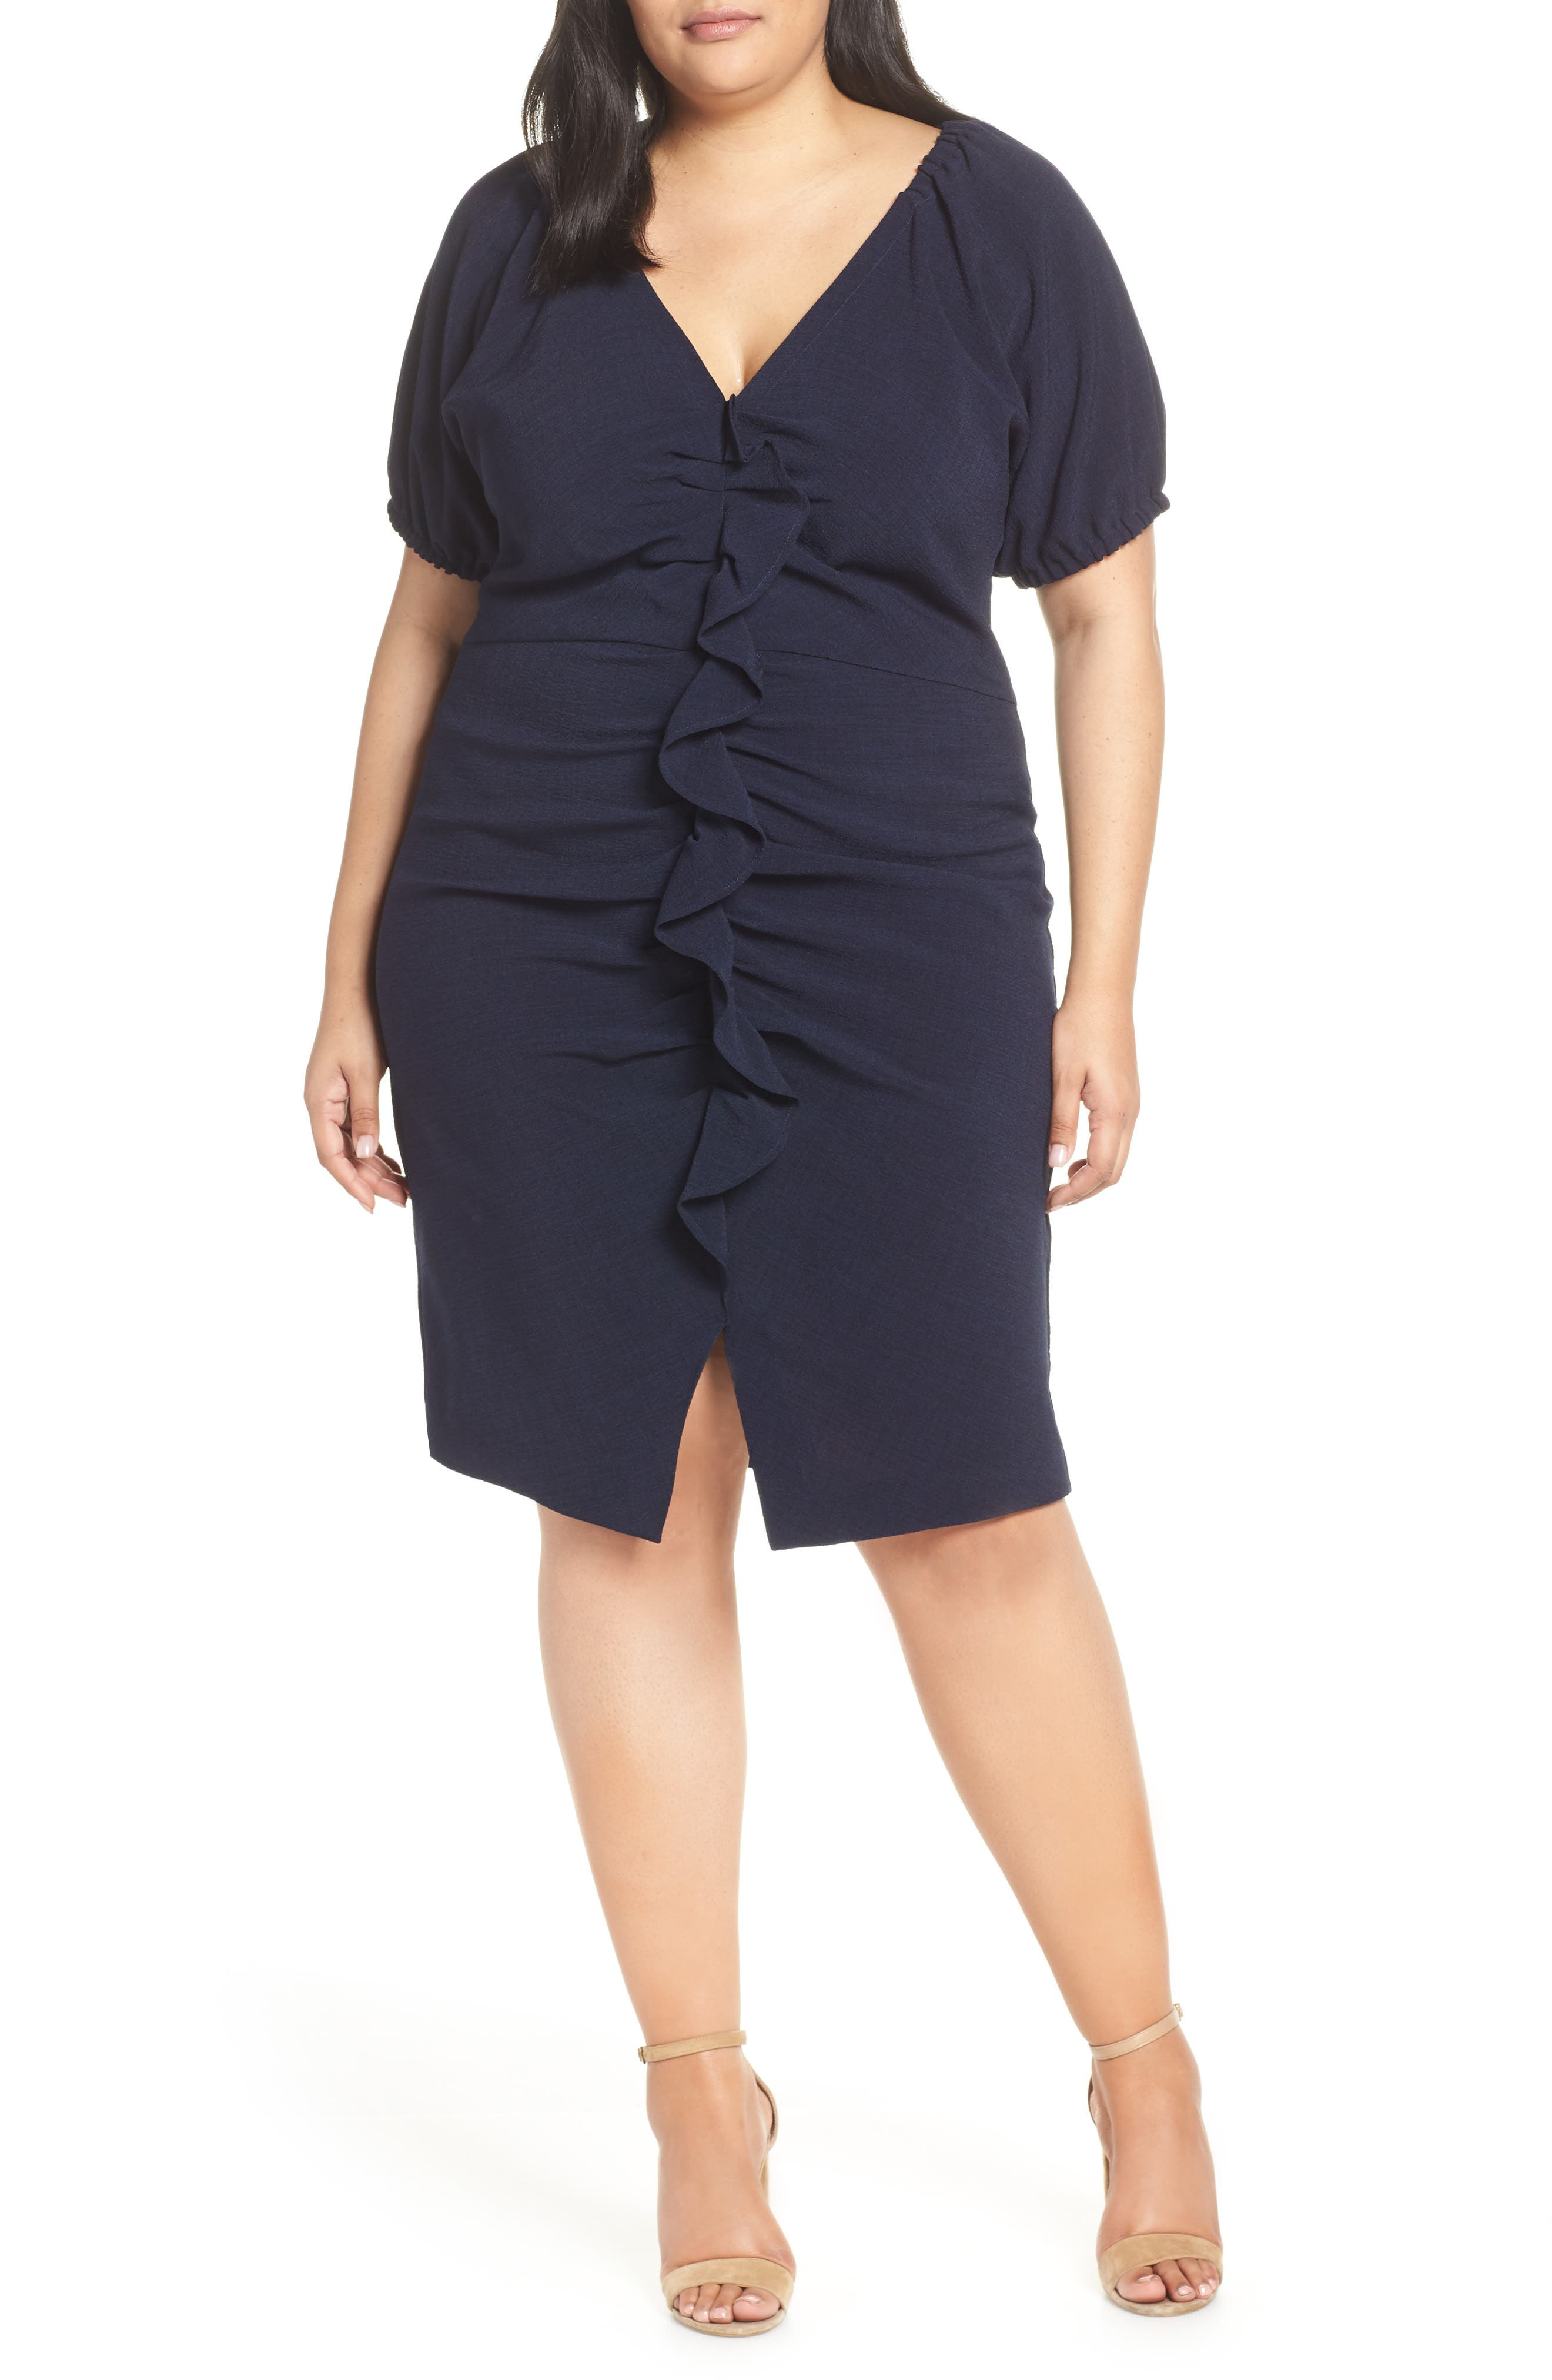 Chelsea28 Ruffle Front Sheath Dress, 4 (similar to 2) - Blue